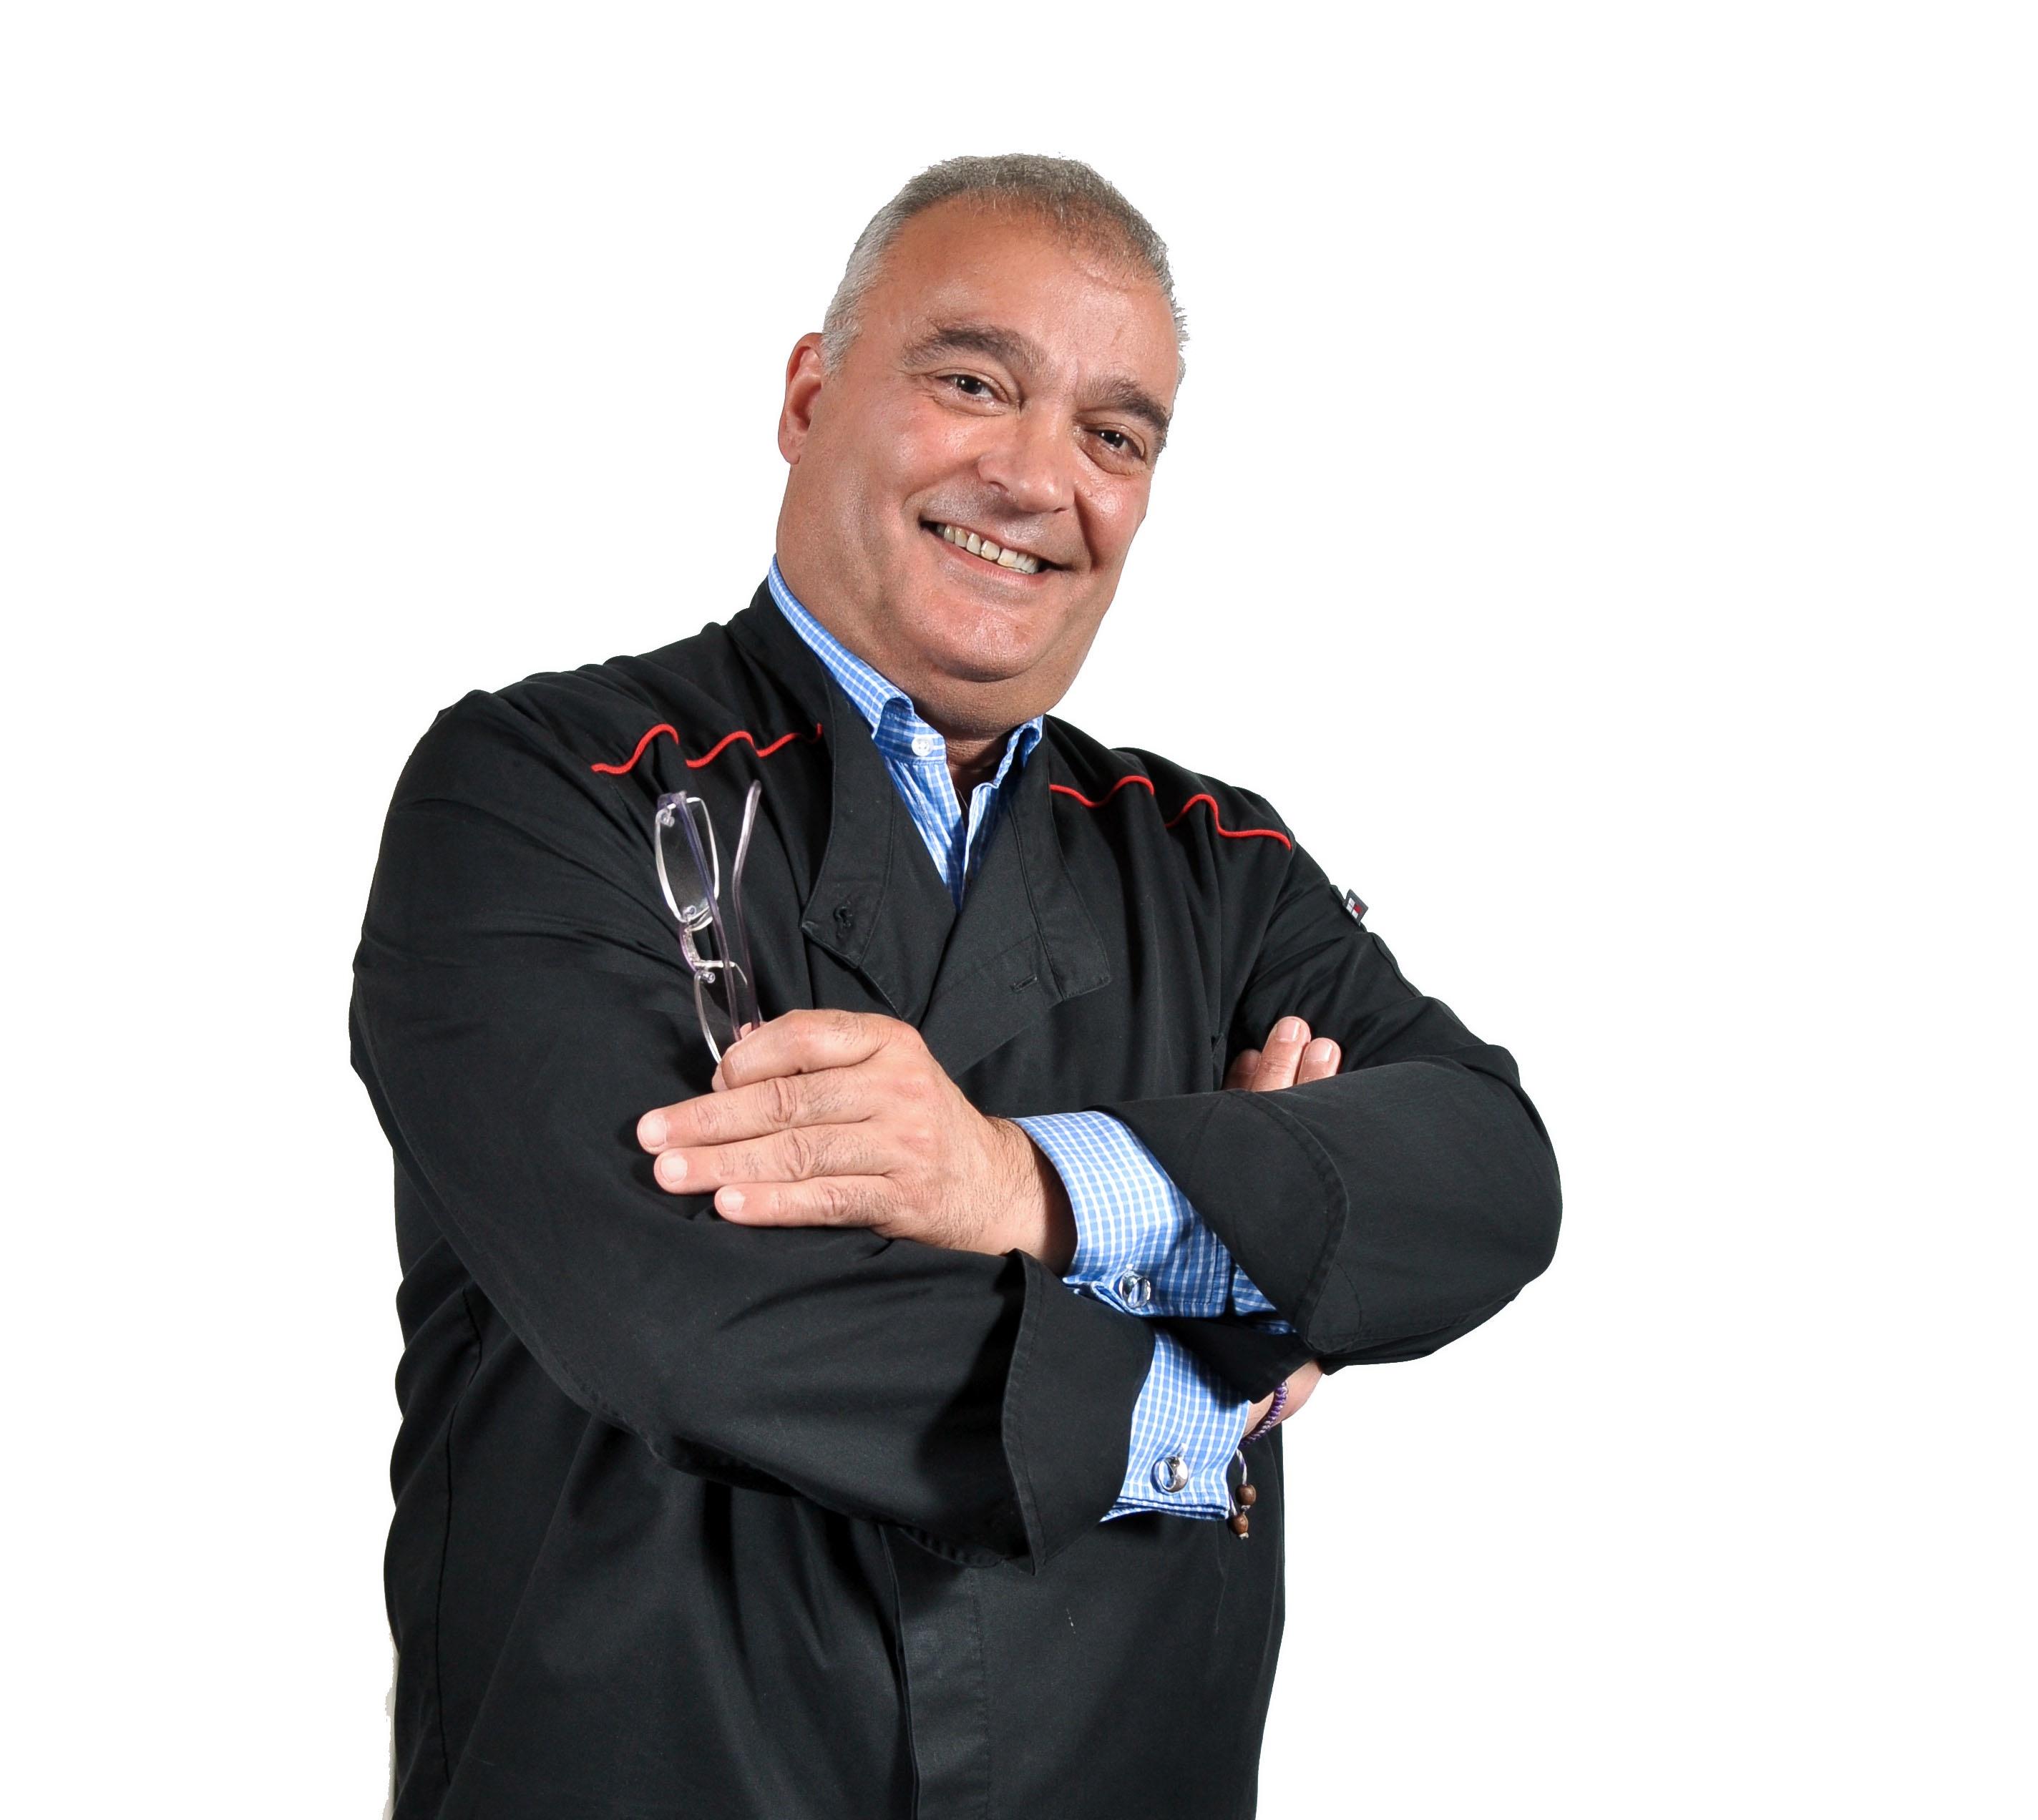 Chef Juantxo Sánchez